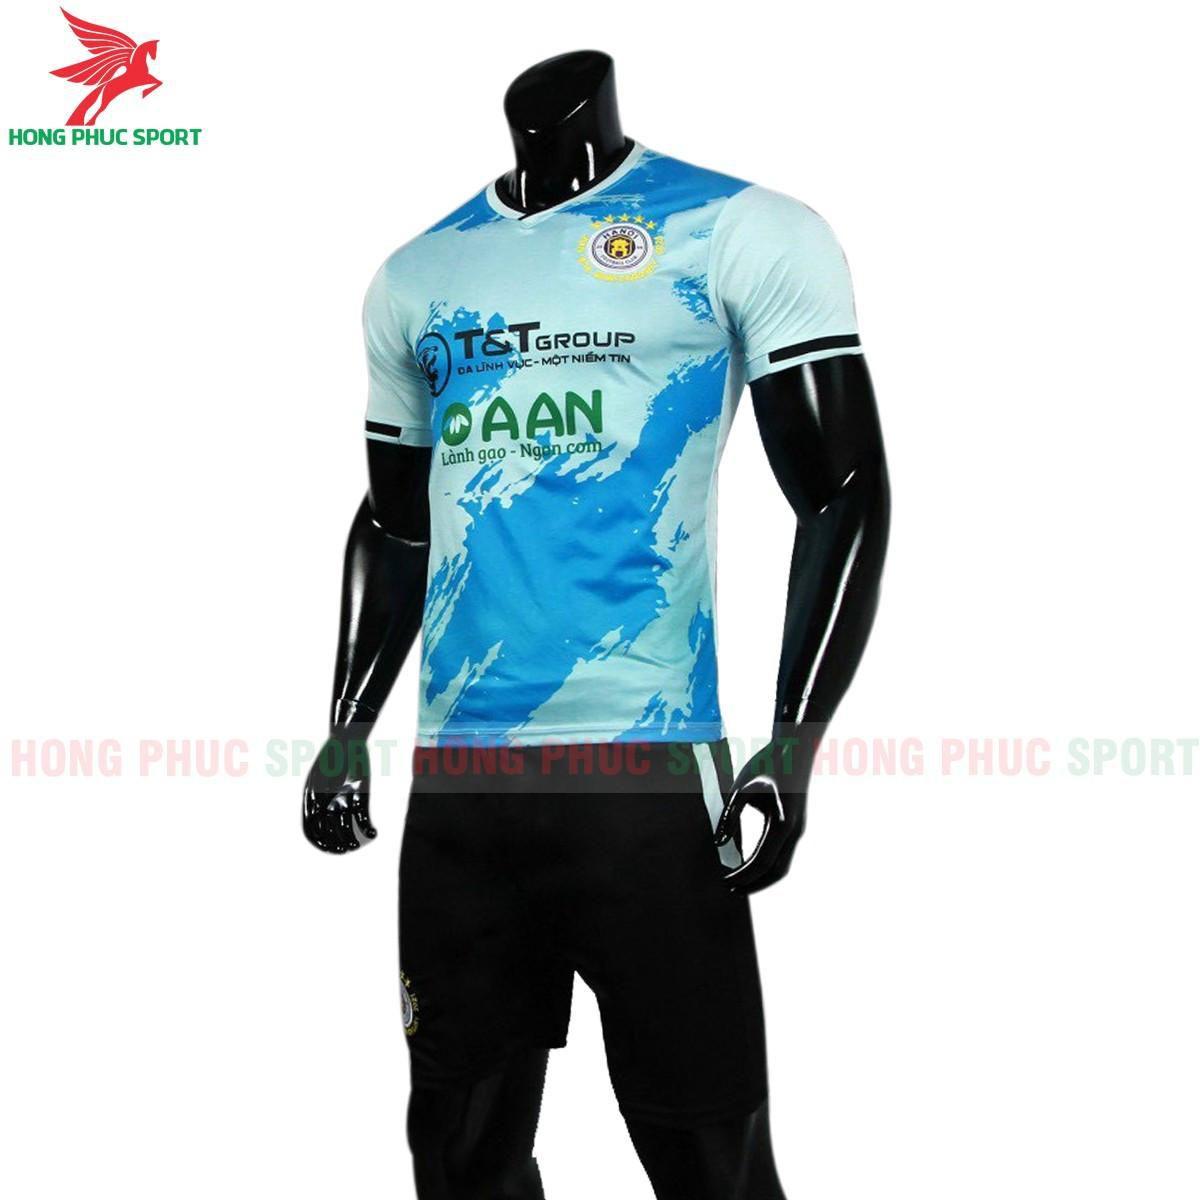 https://cdn.hongphucsport.com/unsafe/s4.shopbay.vn/files/285/ao-bong-da-ha-noi-fc-2021-mau-xanh-ngoc-1-607400825a2fb.jpg